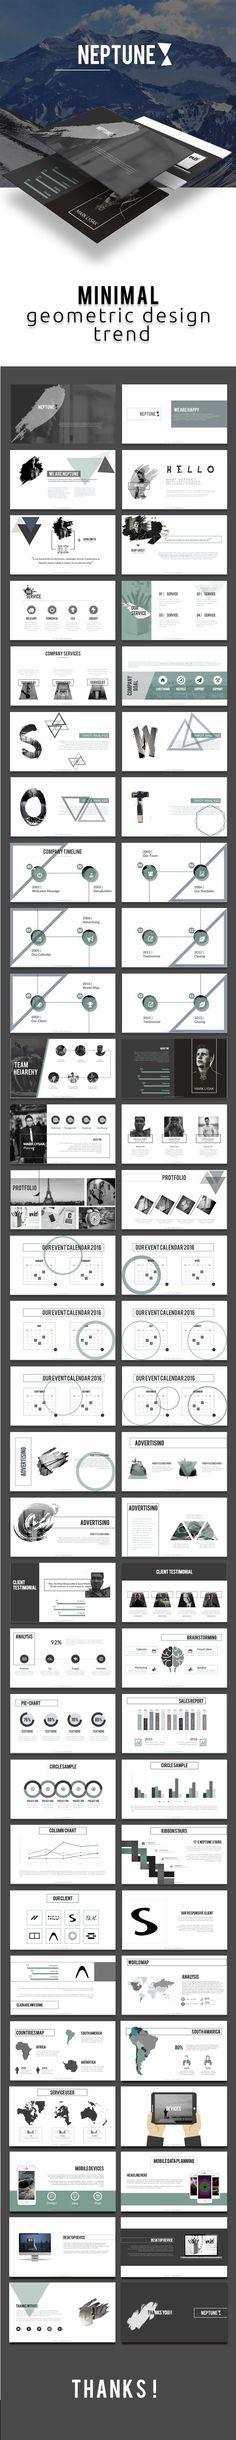 Neptune Powerpoint Template #design #sliders Buy Now: https://graphicriver.net/item/neptune-powerpoint-template/15949628